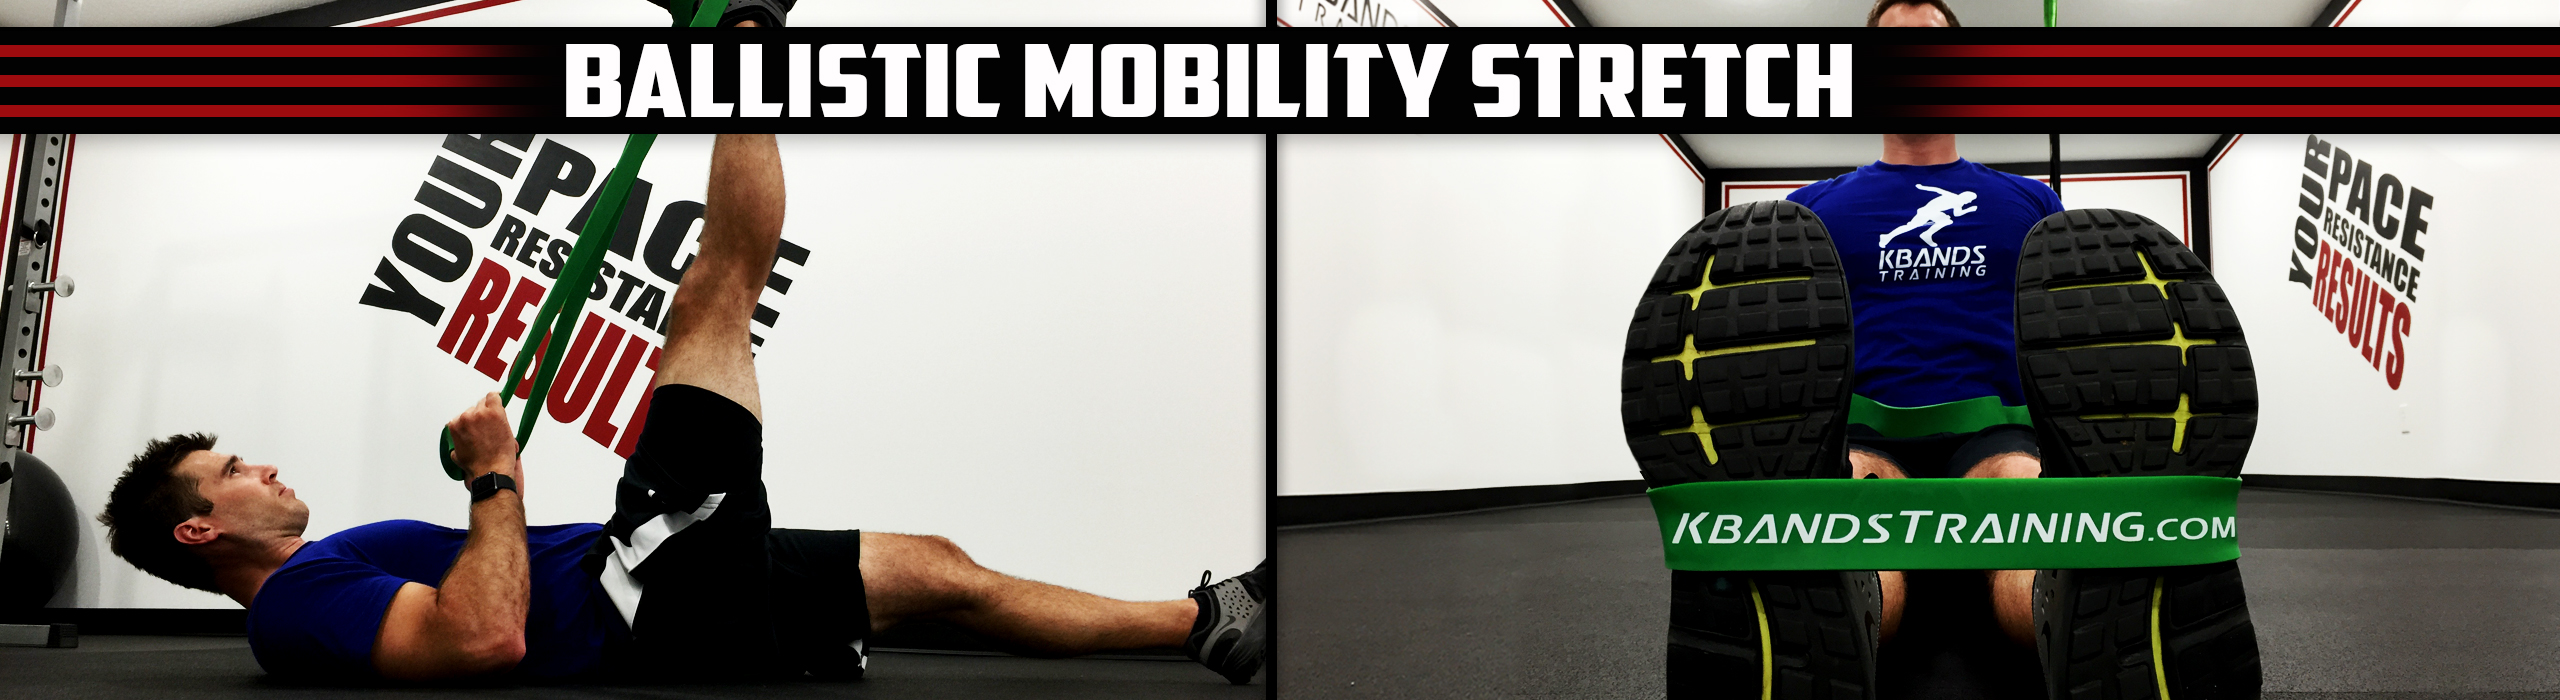 Ballistic Mobility